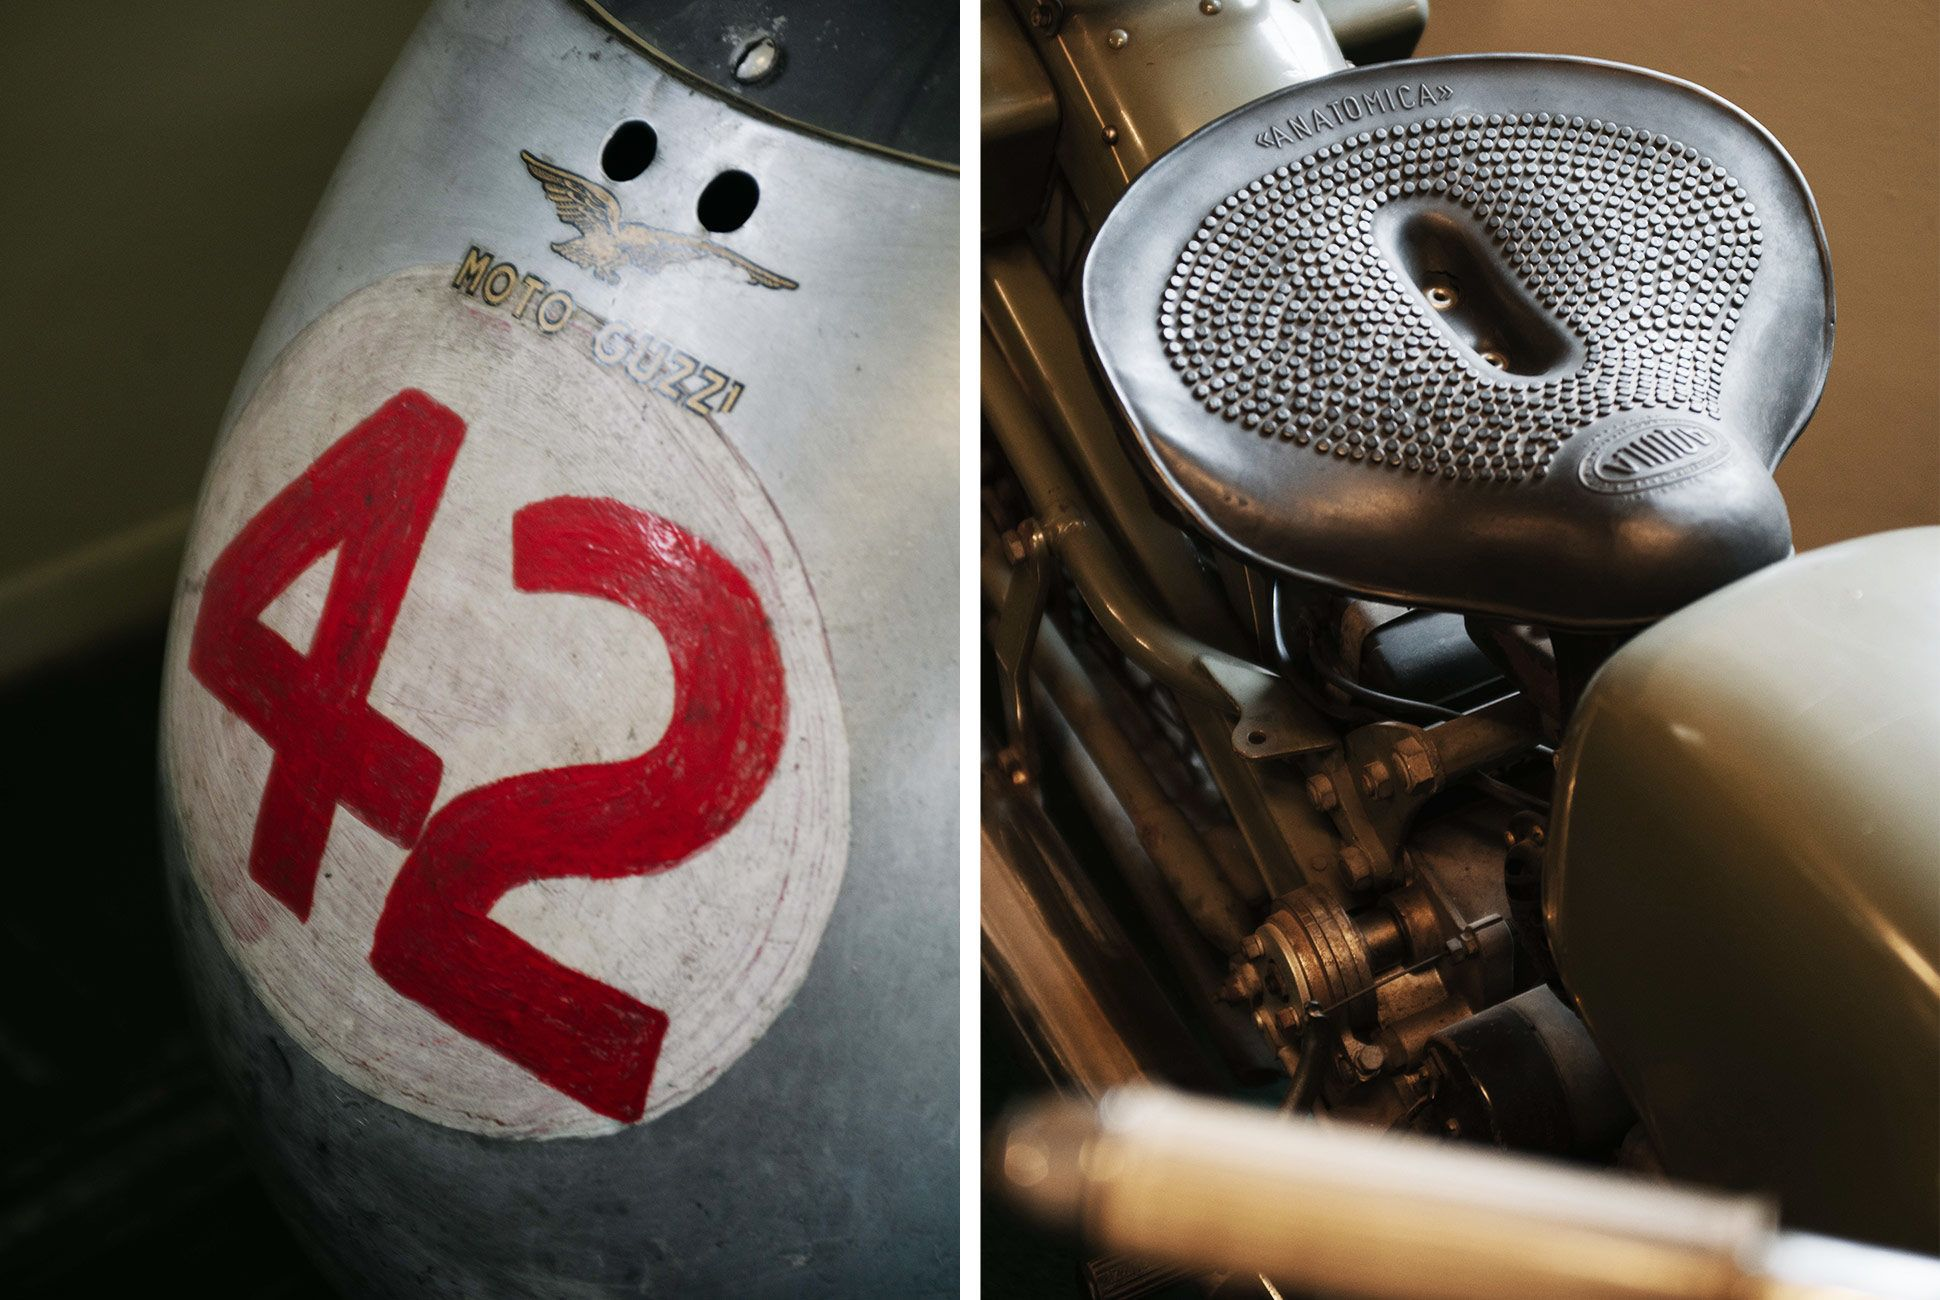 Moto-Guzzi-Factory-Tour-gear-patrol-slide-8